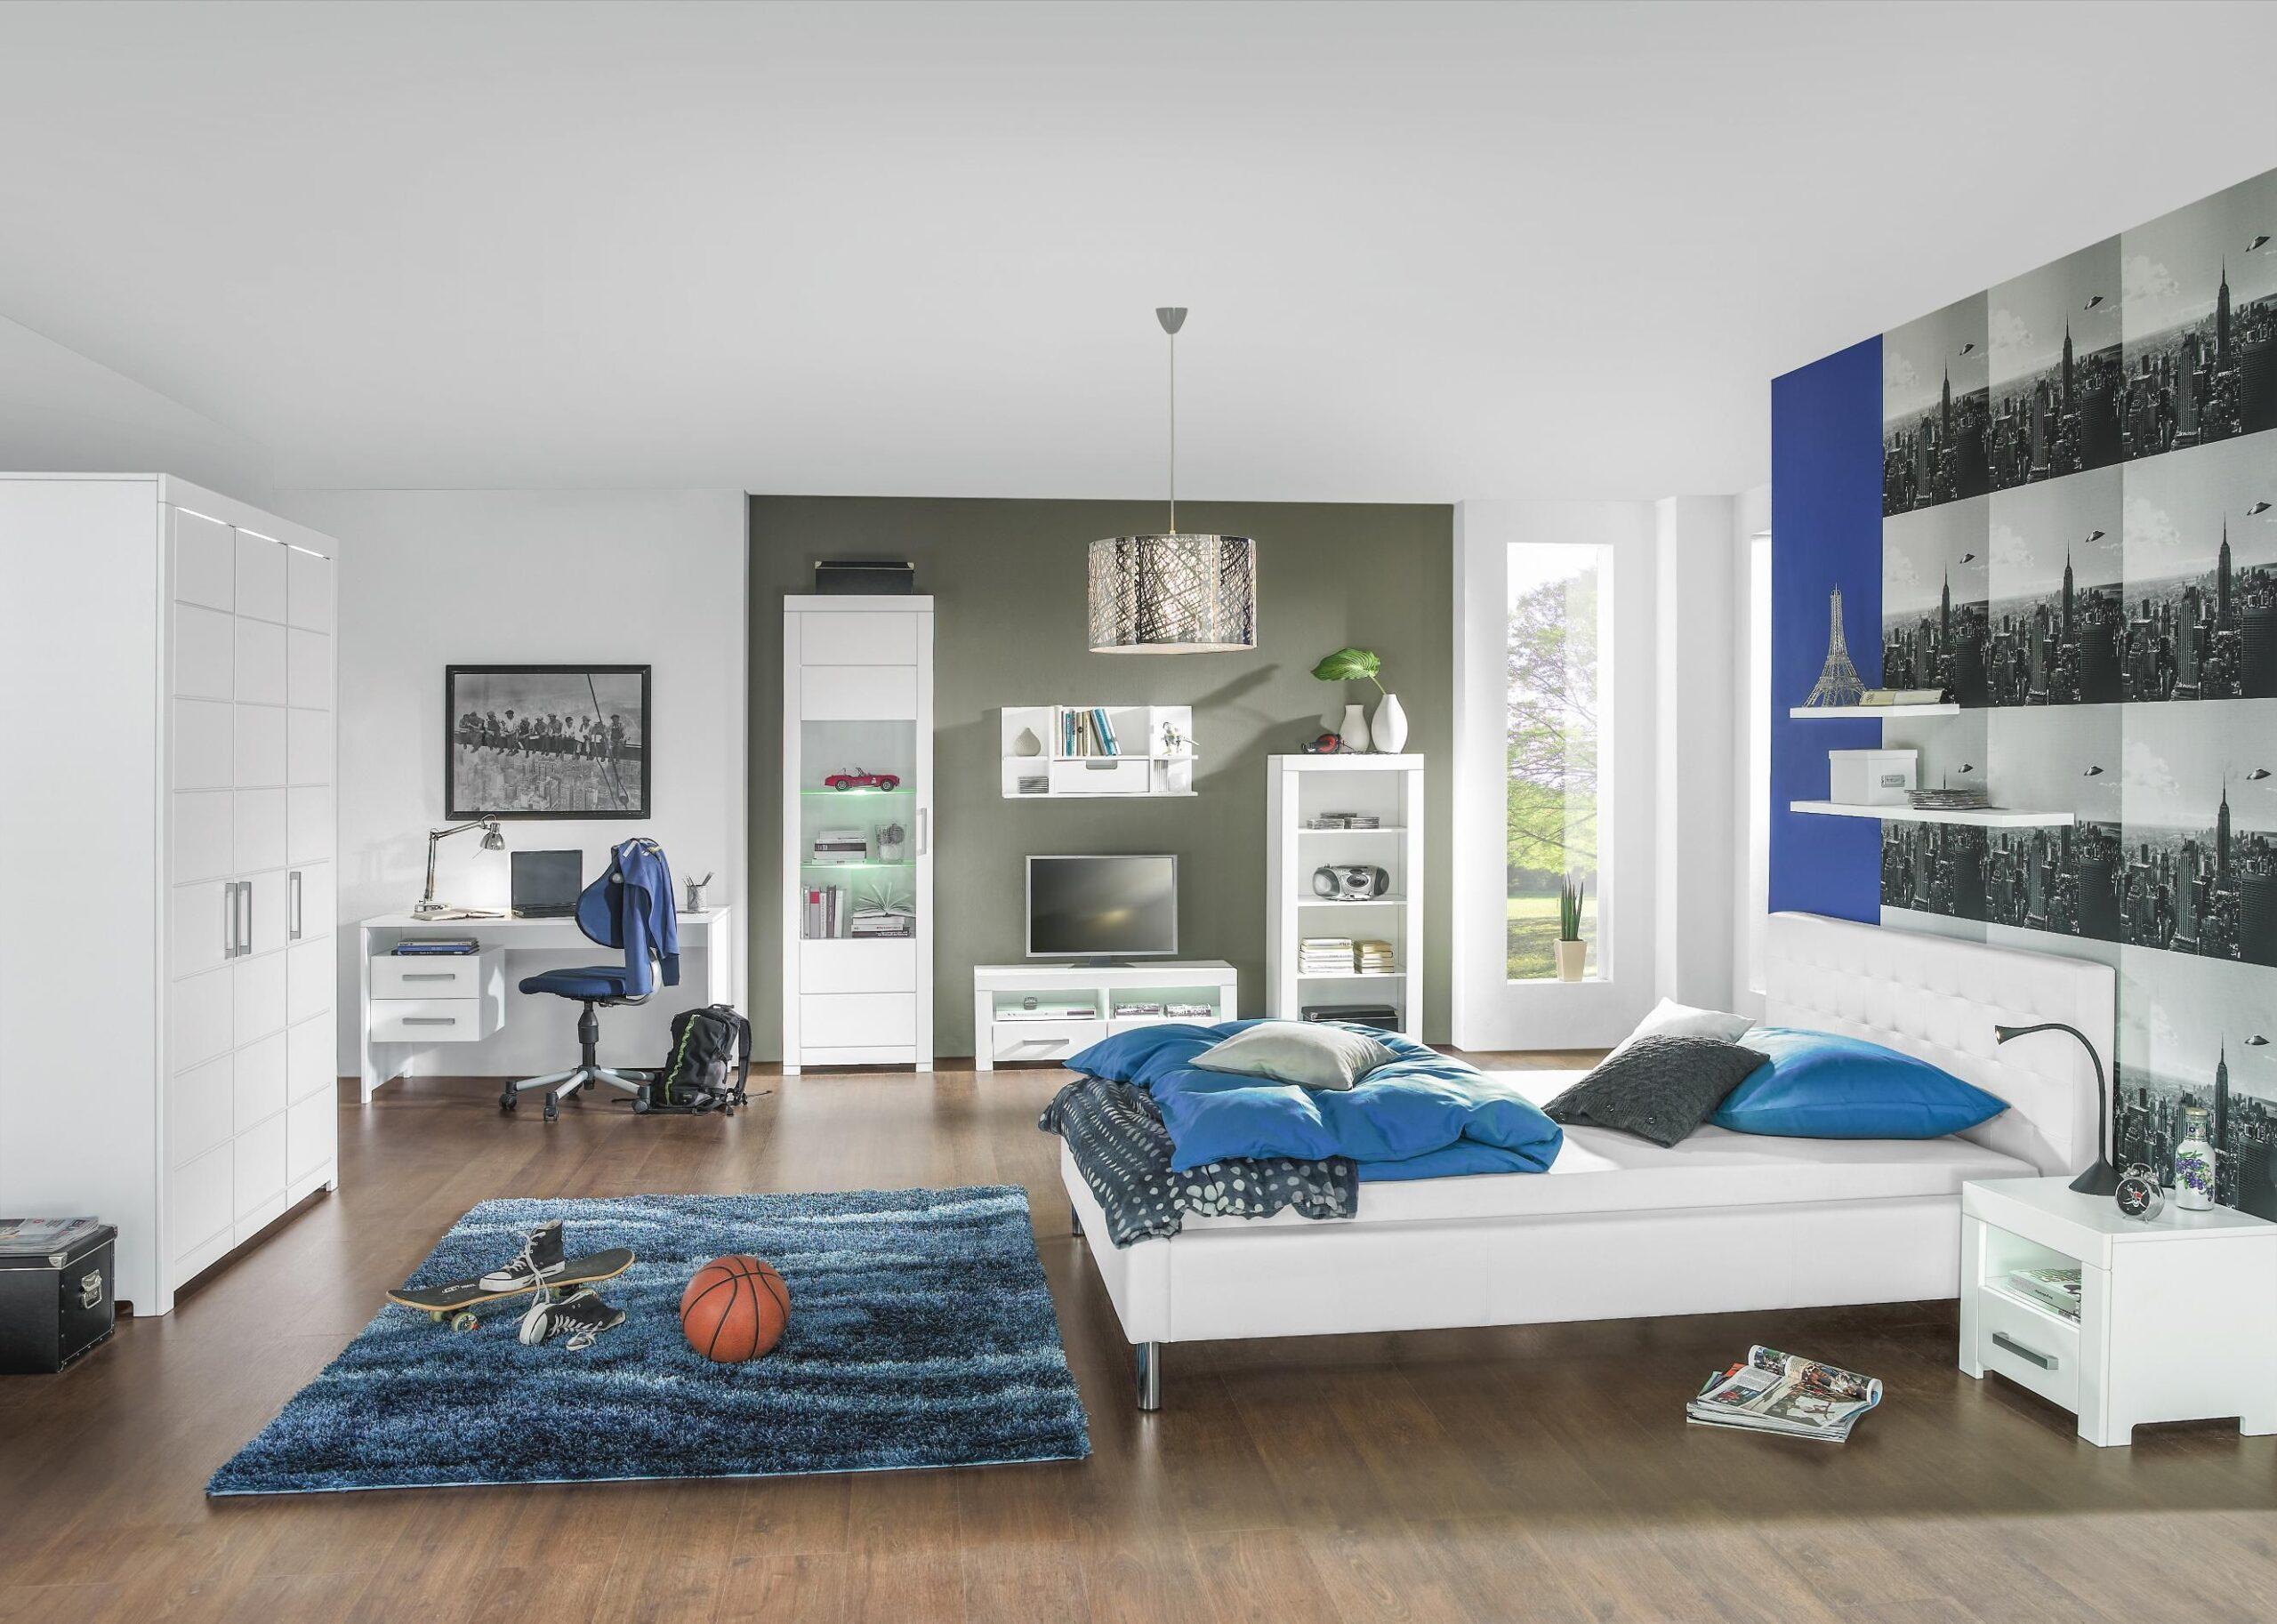 Full Size of Jugendzimmer Von Xora Dengan Gambar Rumah Sofa Bett Wohnzimmer Xora Jugendzimmer